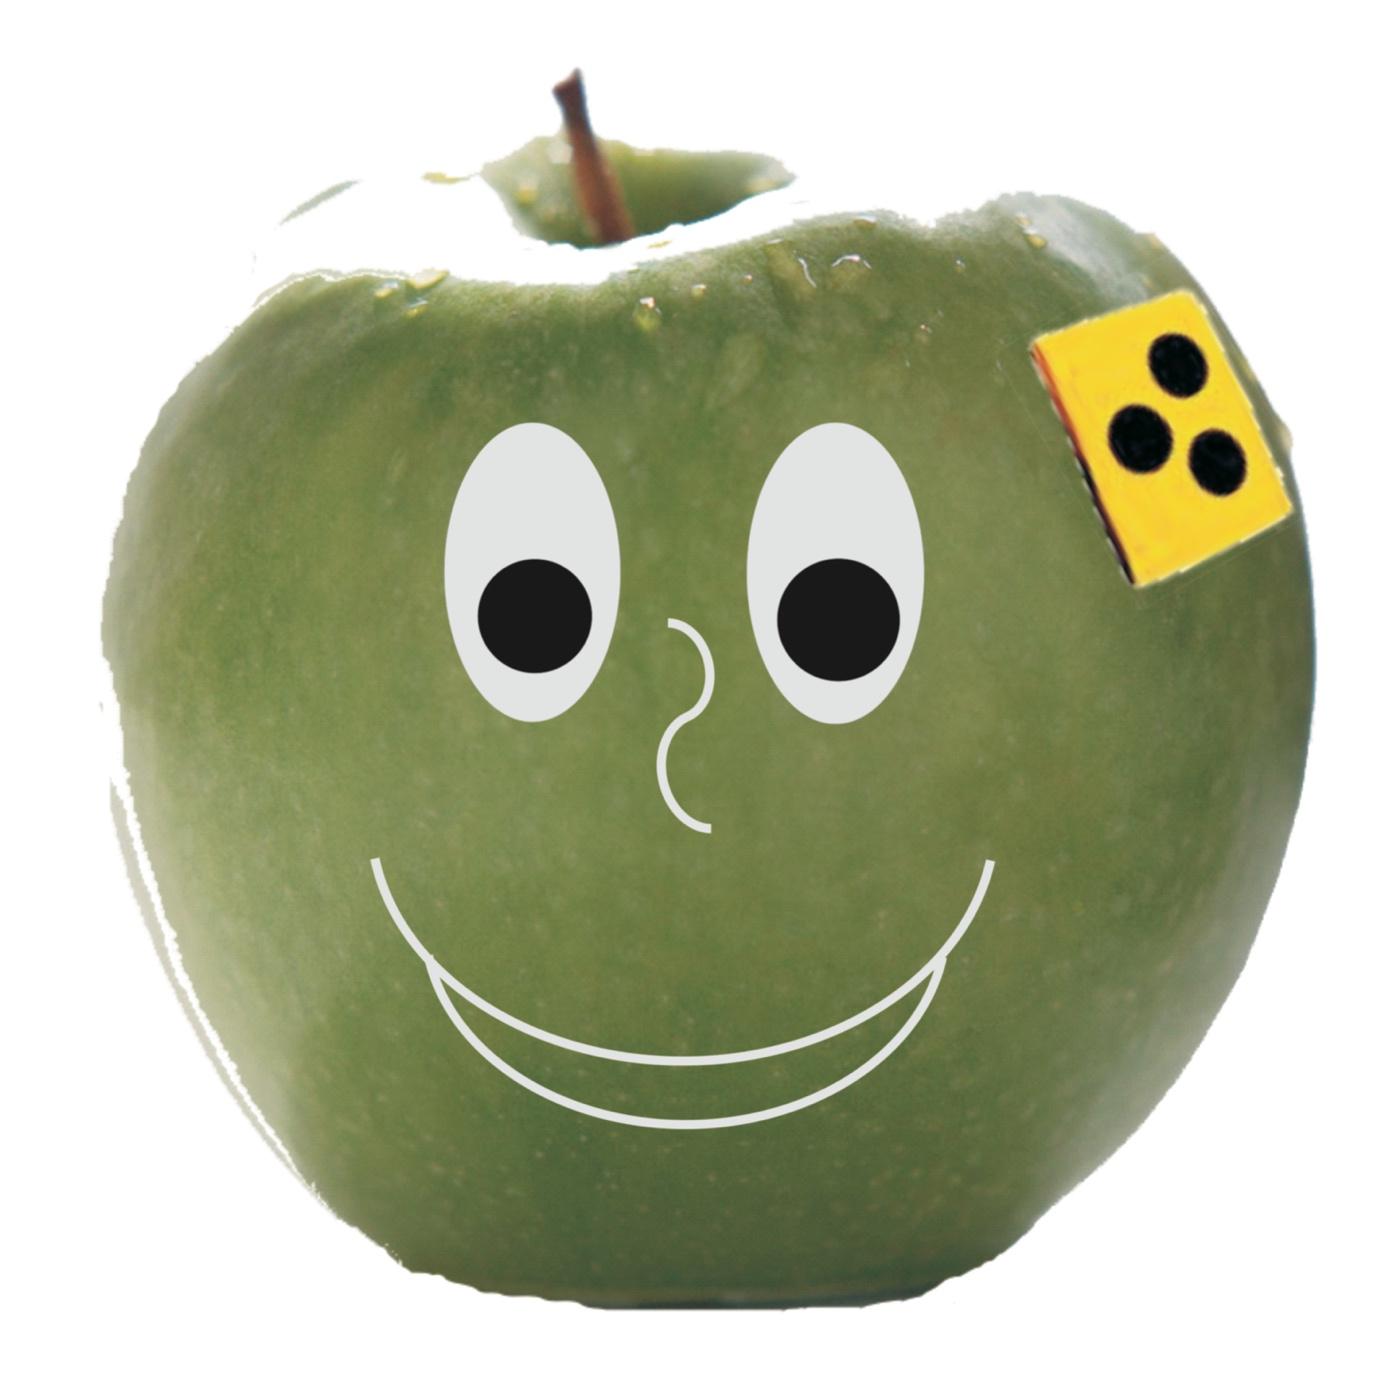 Apfel-Fleger Podcast